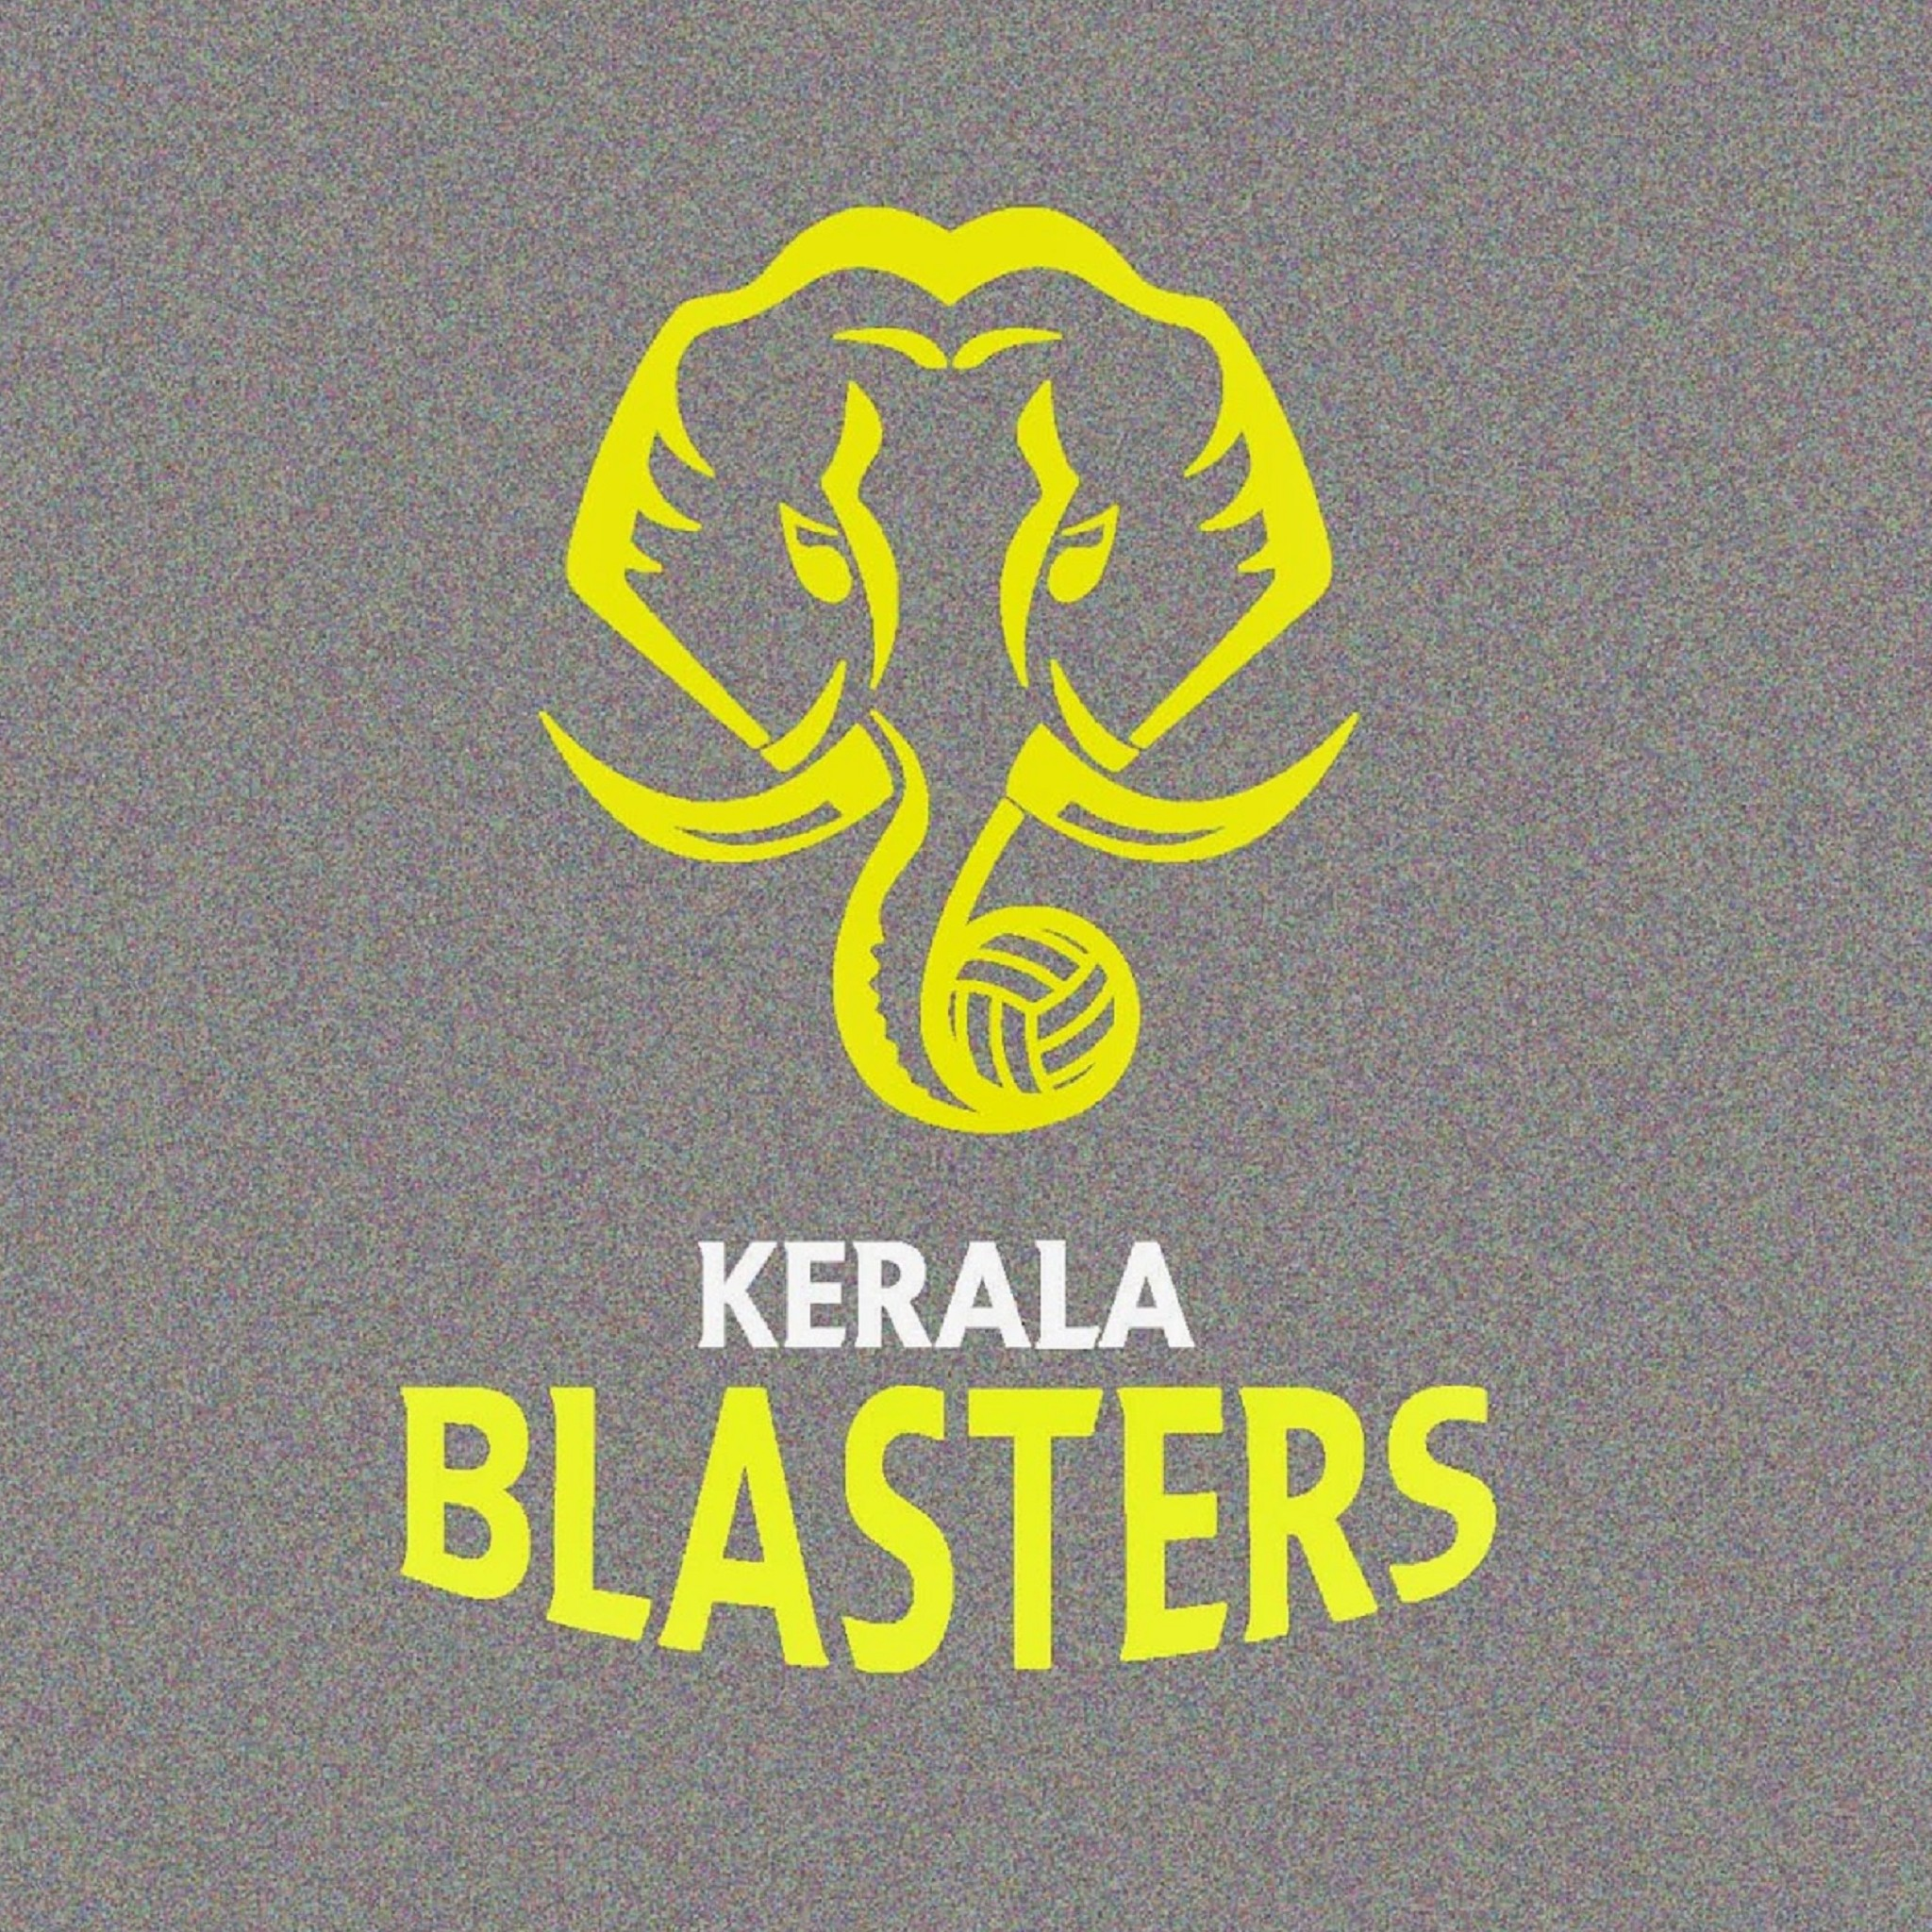 Hd Wallpapers   Logo Kerala Blasters Hd Wallpaper 2048x2048